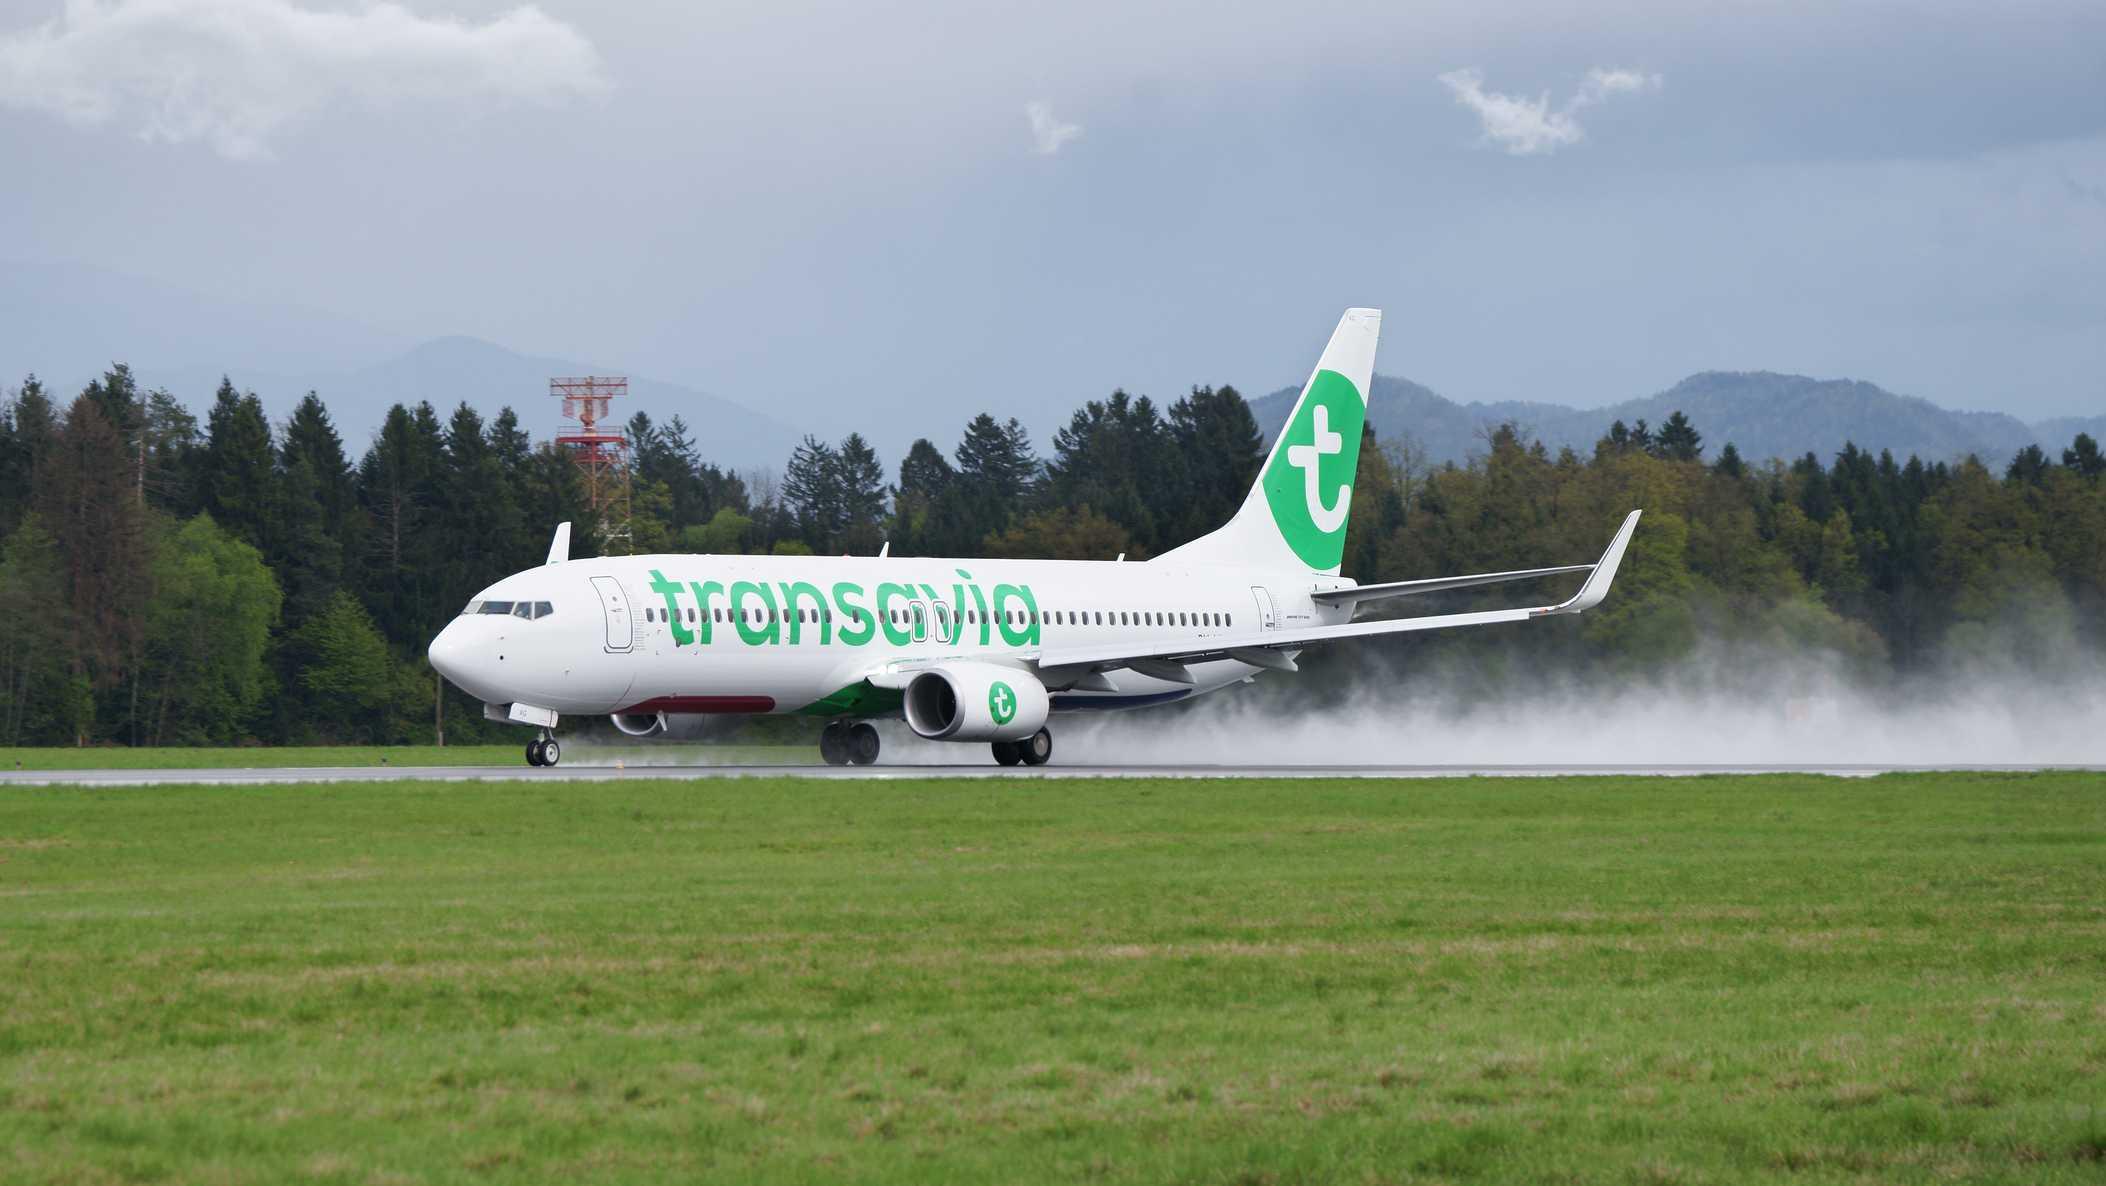 Transavia Boeing 737-8K2 stock image